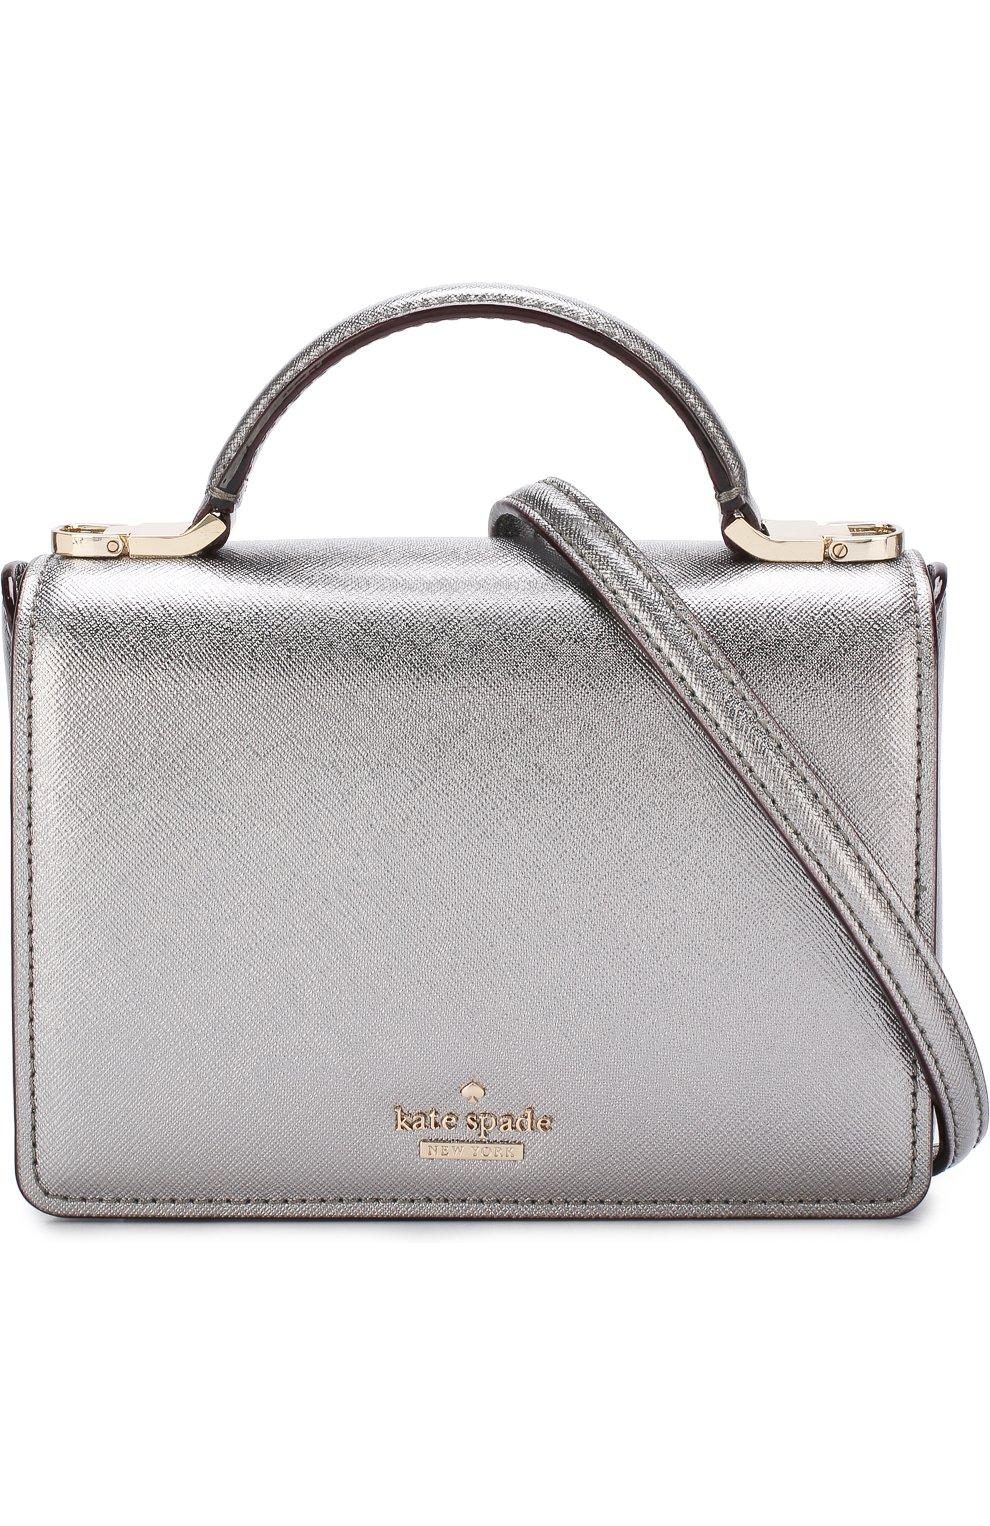 cc016a5f5aab Женская сумка cameron street KATE SPADE NEW YORK серая цвета ...